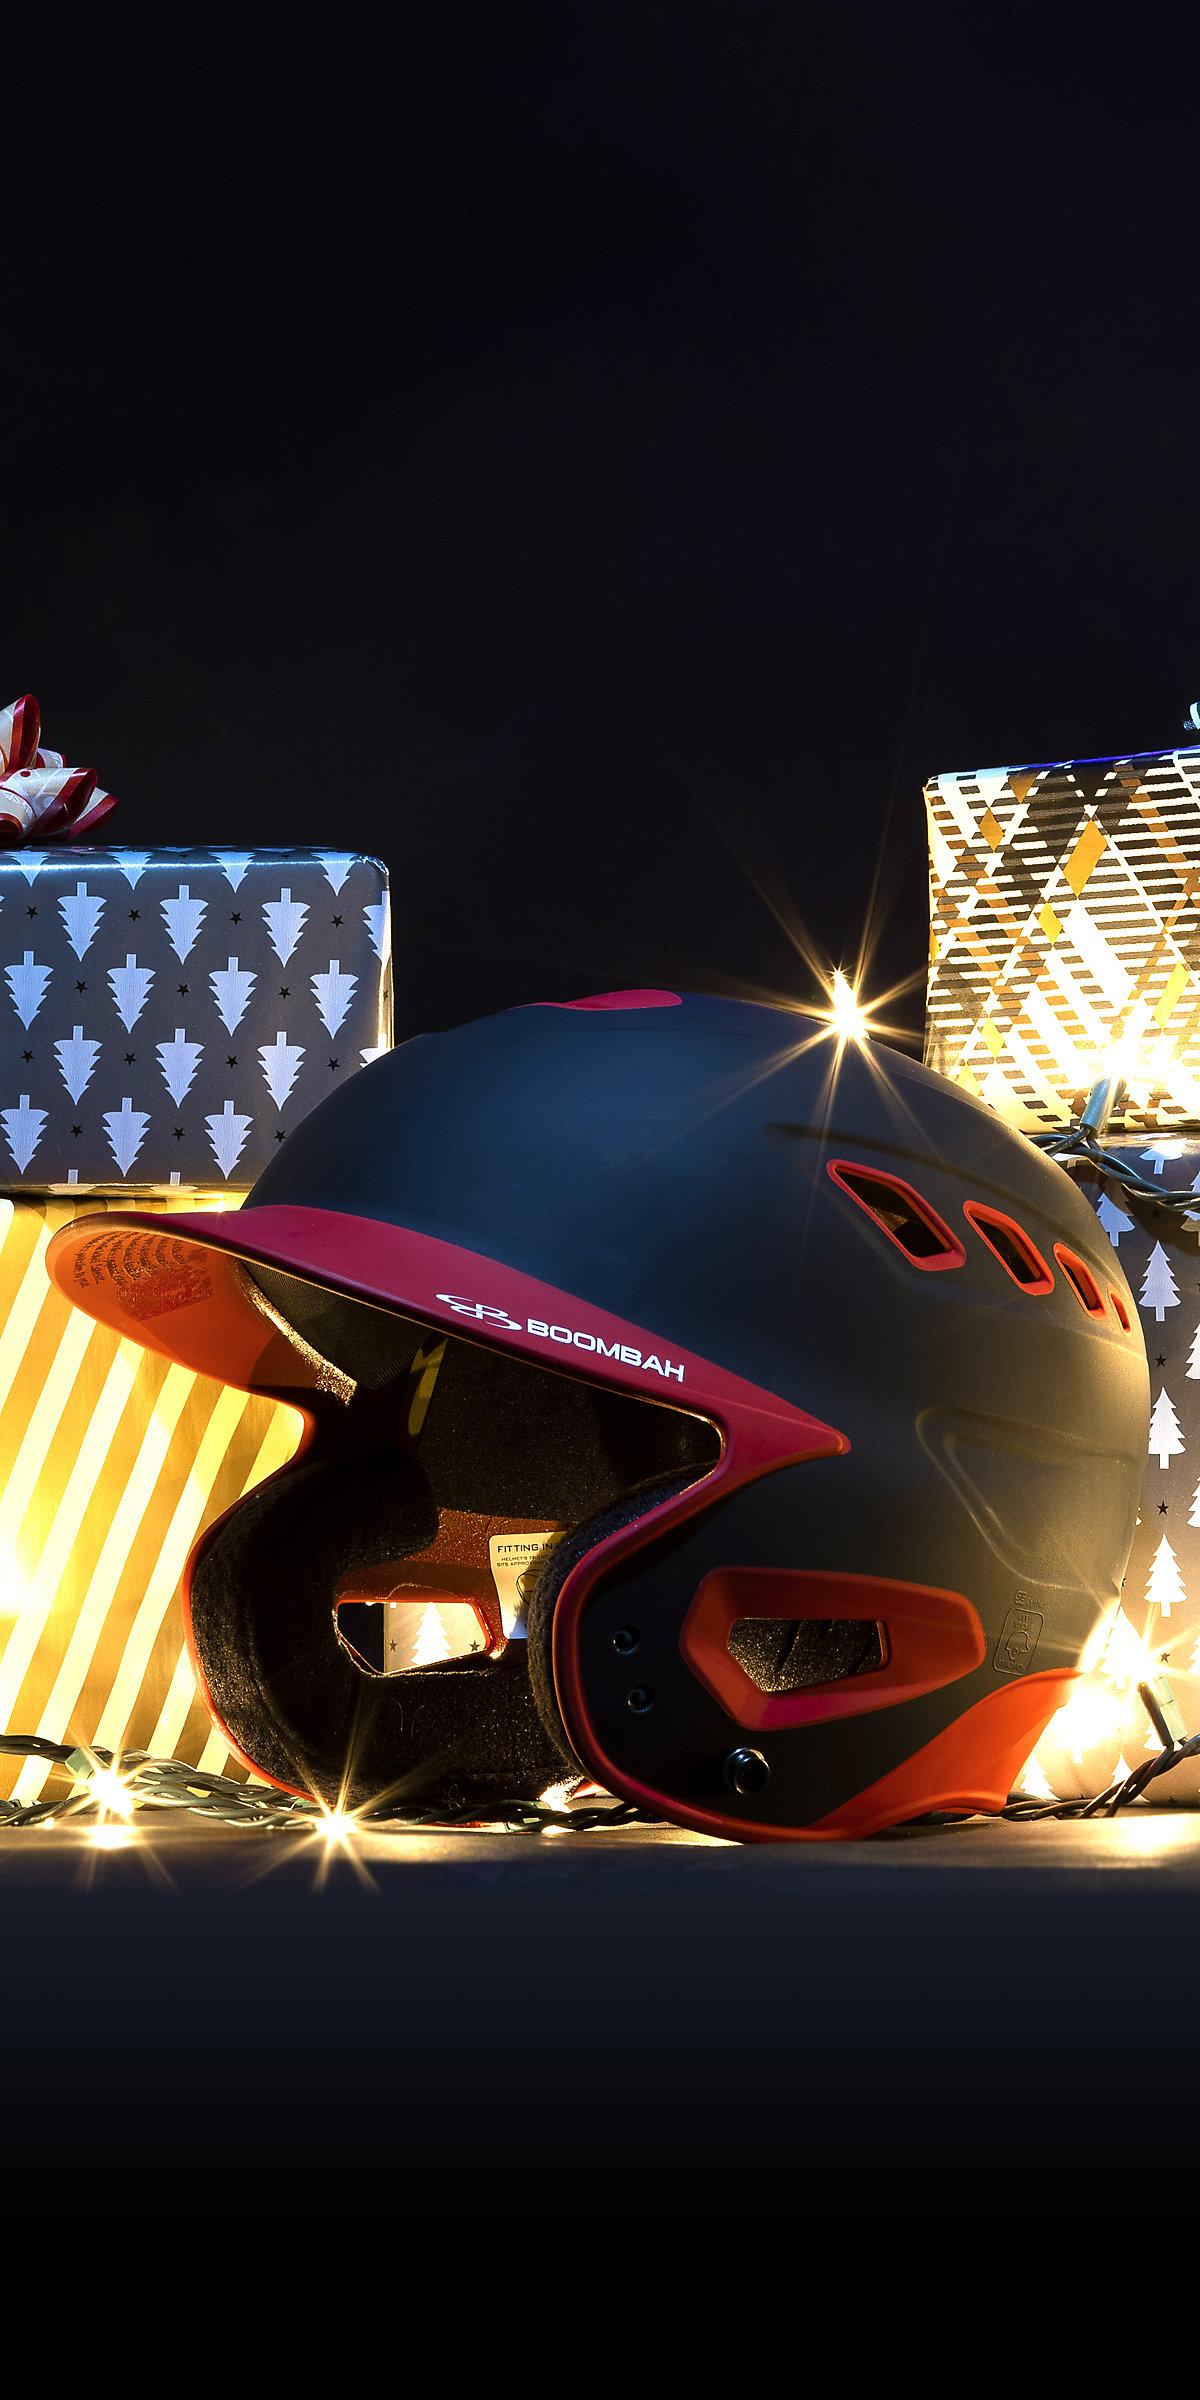 10% Off Batting Helmets - Use Code HOLIDAY10